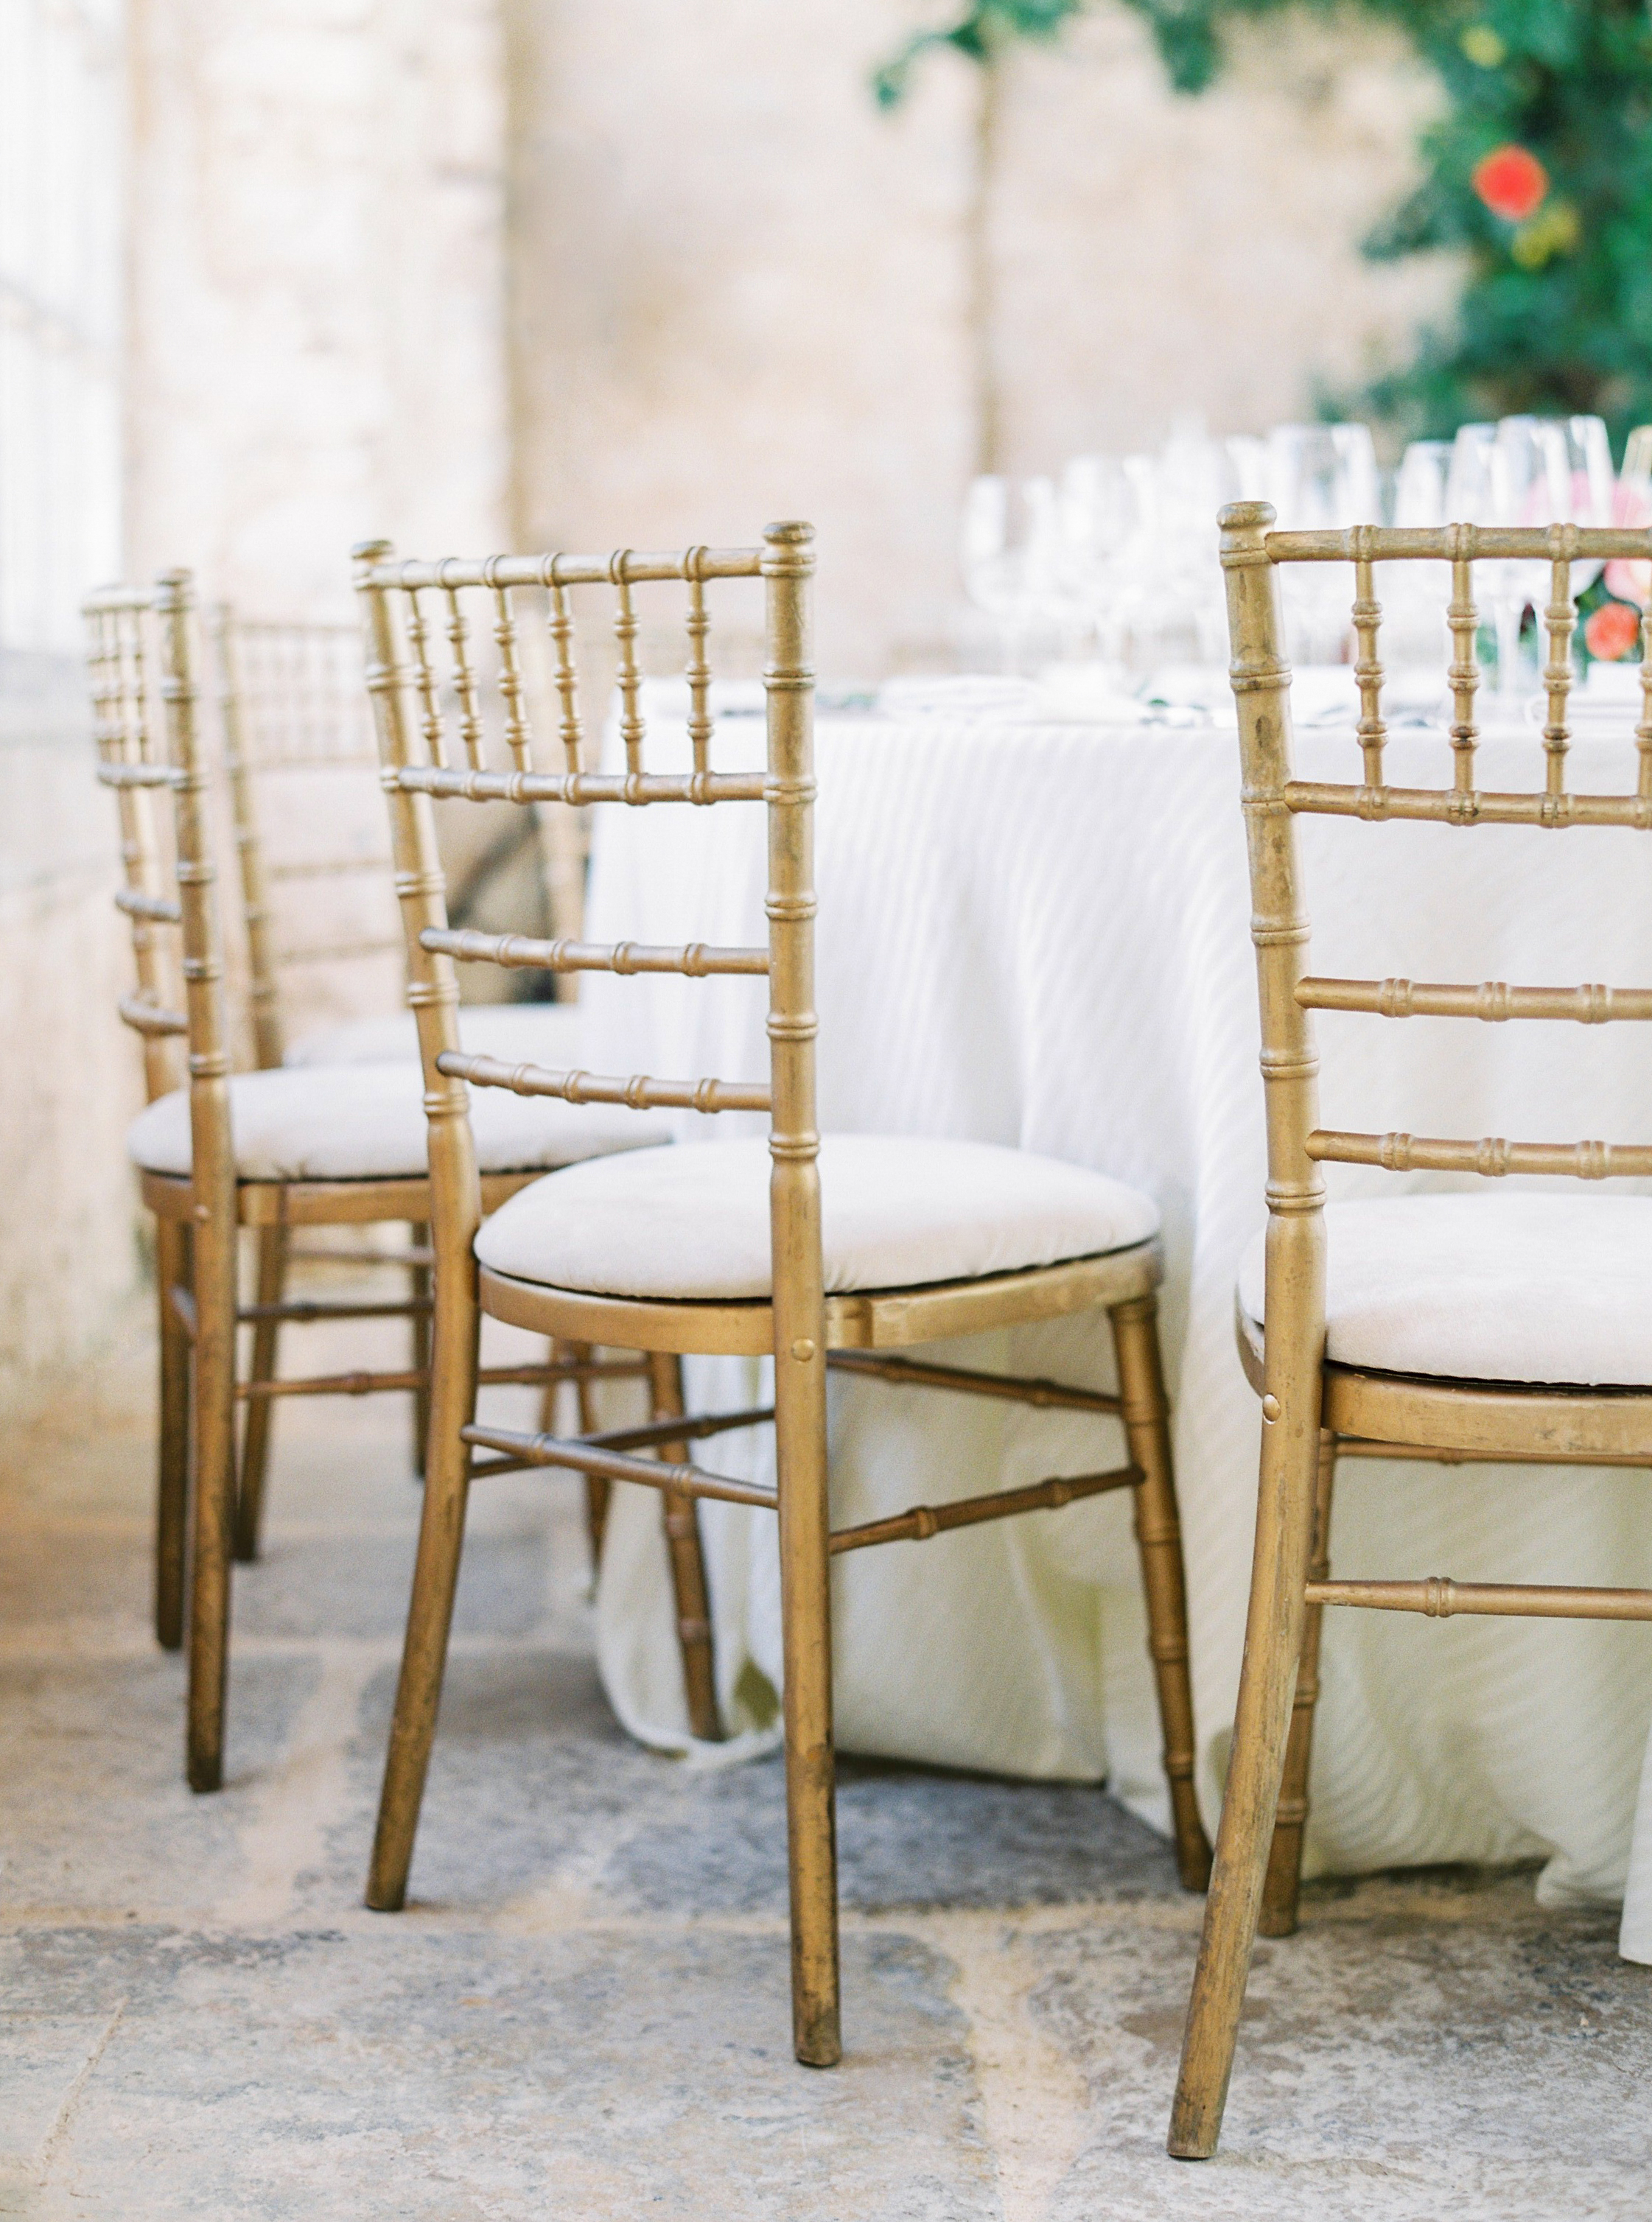 Nastia_Vesna_Photography_Wedding_Portugal_45.jpg